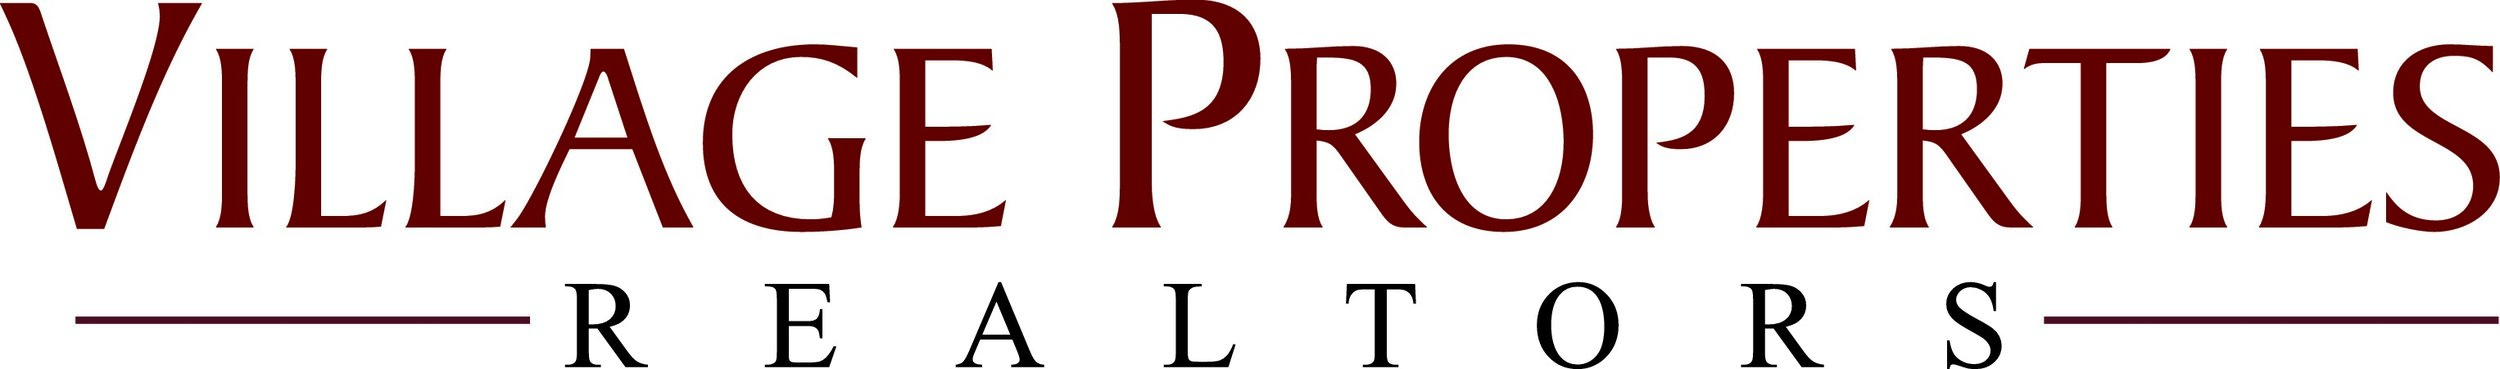 Village_Properties_Red__Black_Logo.eps.jpg